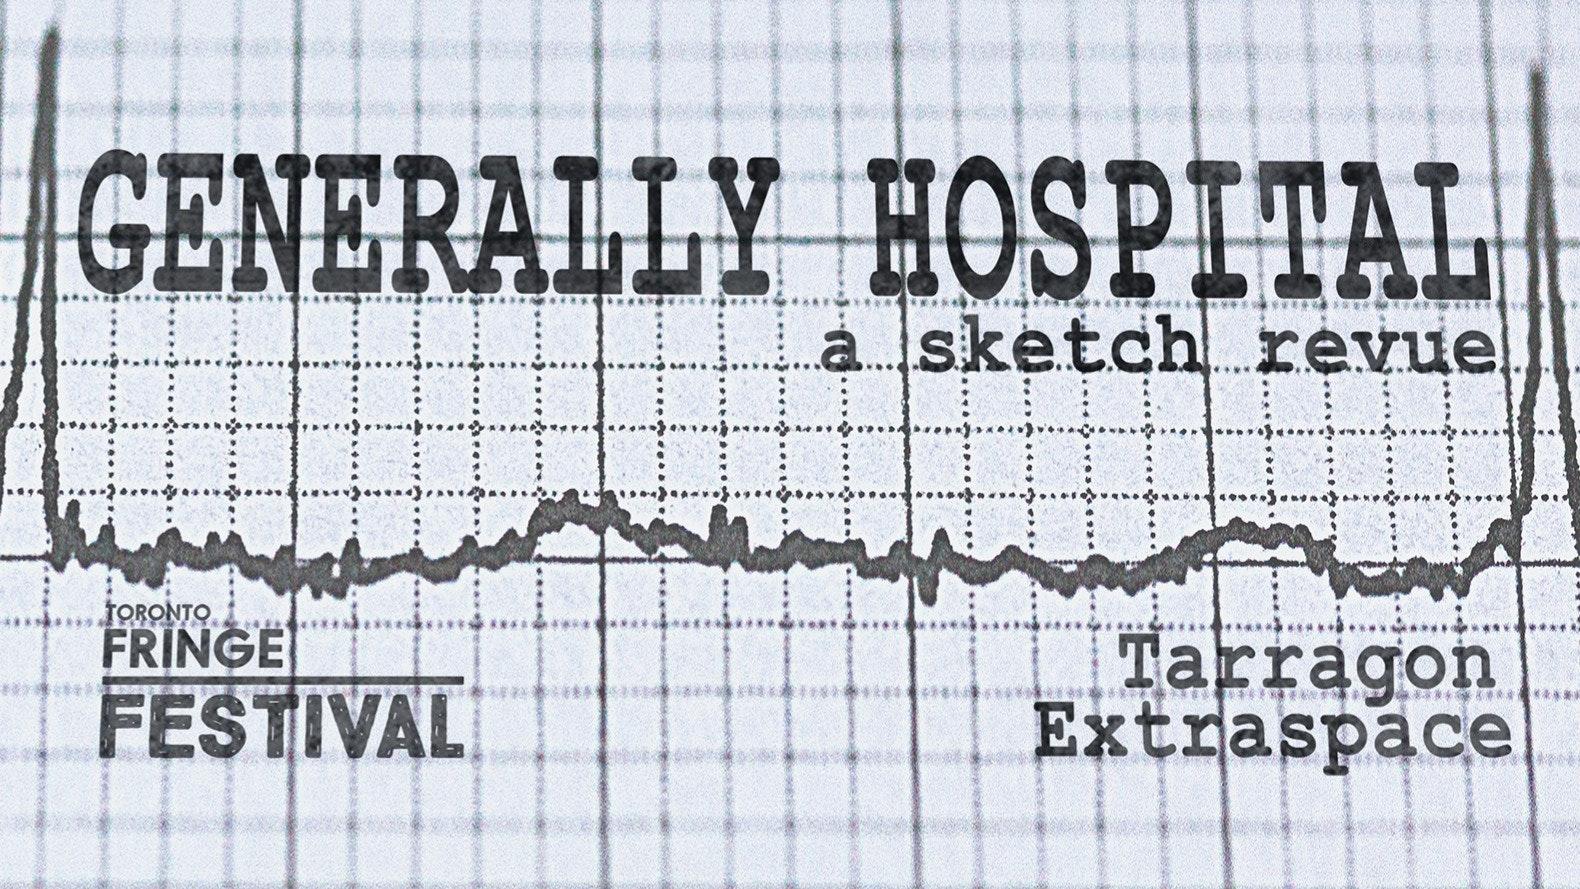 Generally Hospital